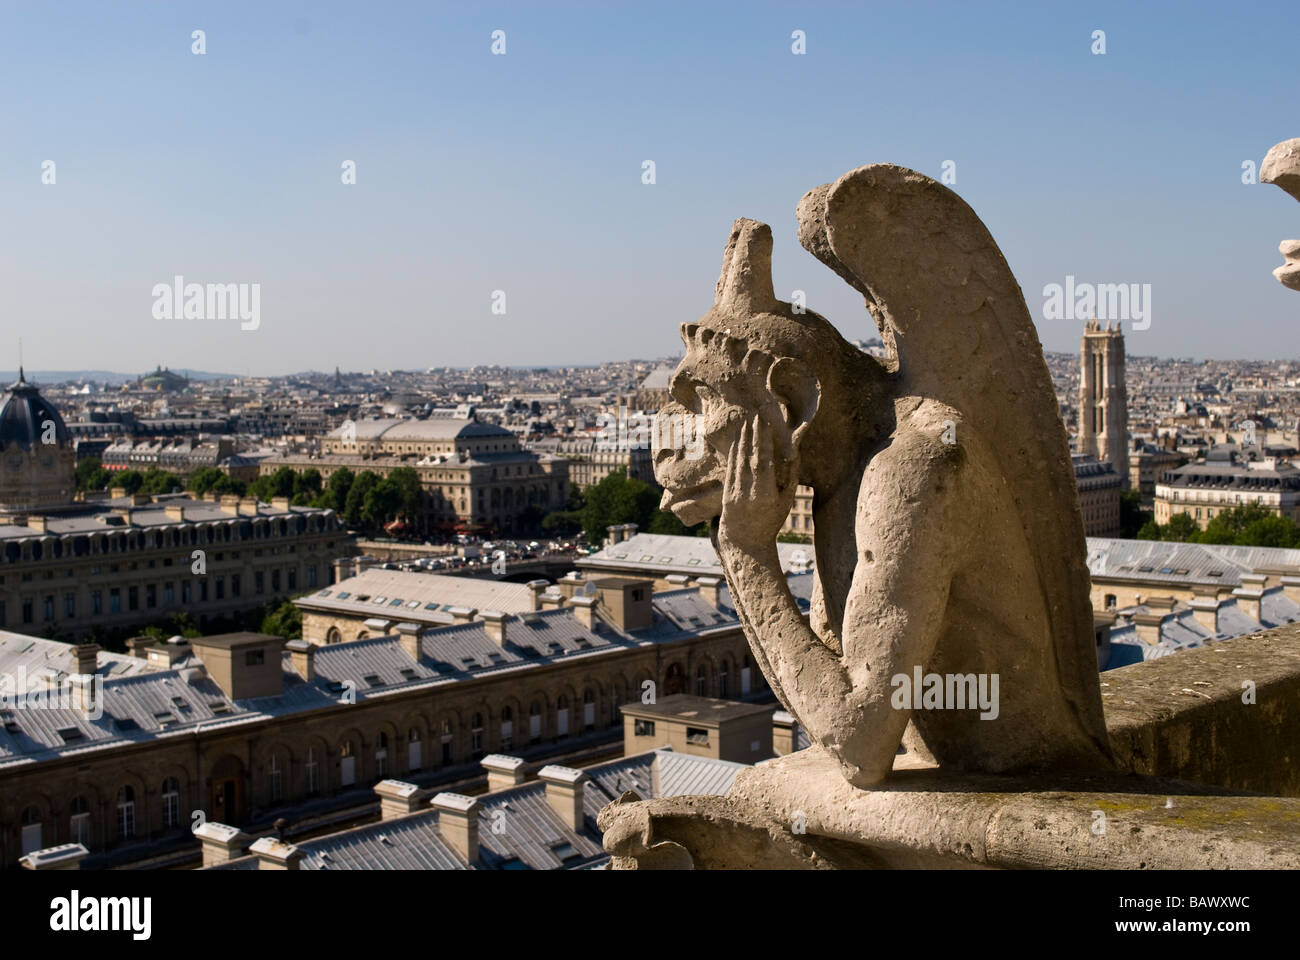 Gargoyle on notre dame cathedral paris - Stock Image